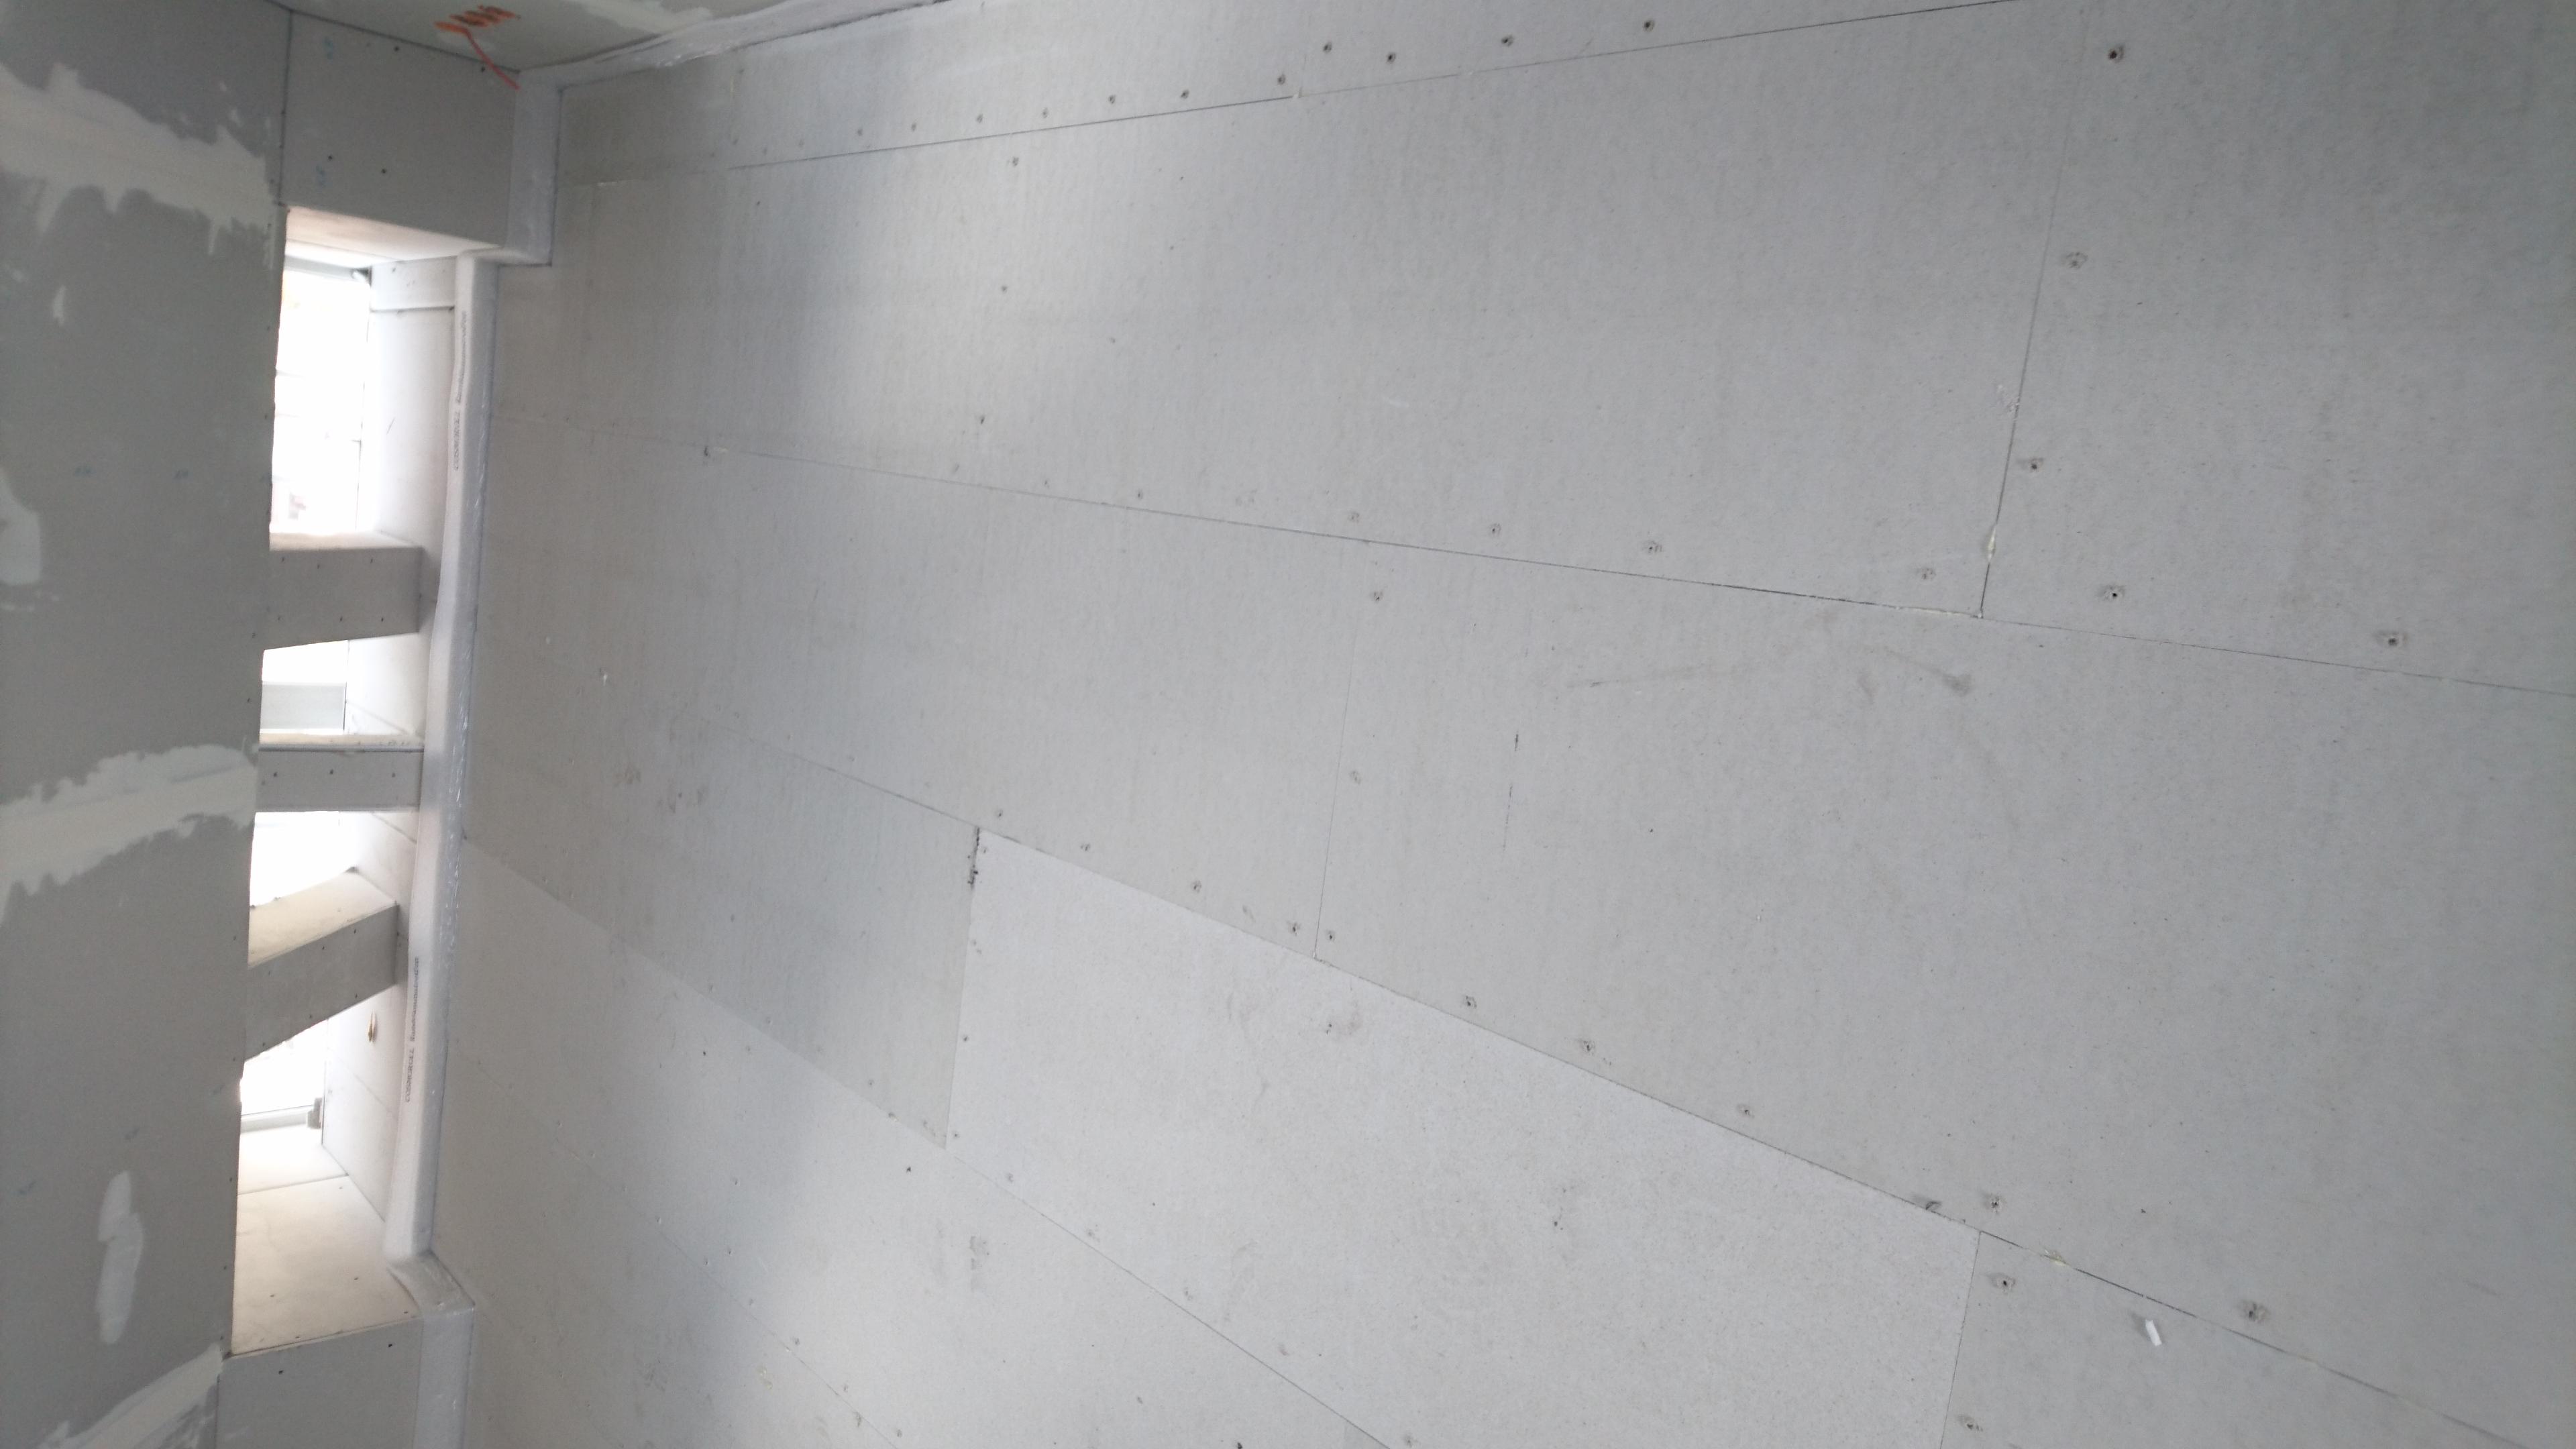 trockenbau mode bau bauausf hrungen berlin. Black Bedroom Furniture Sets. Home Design Ideas